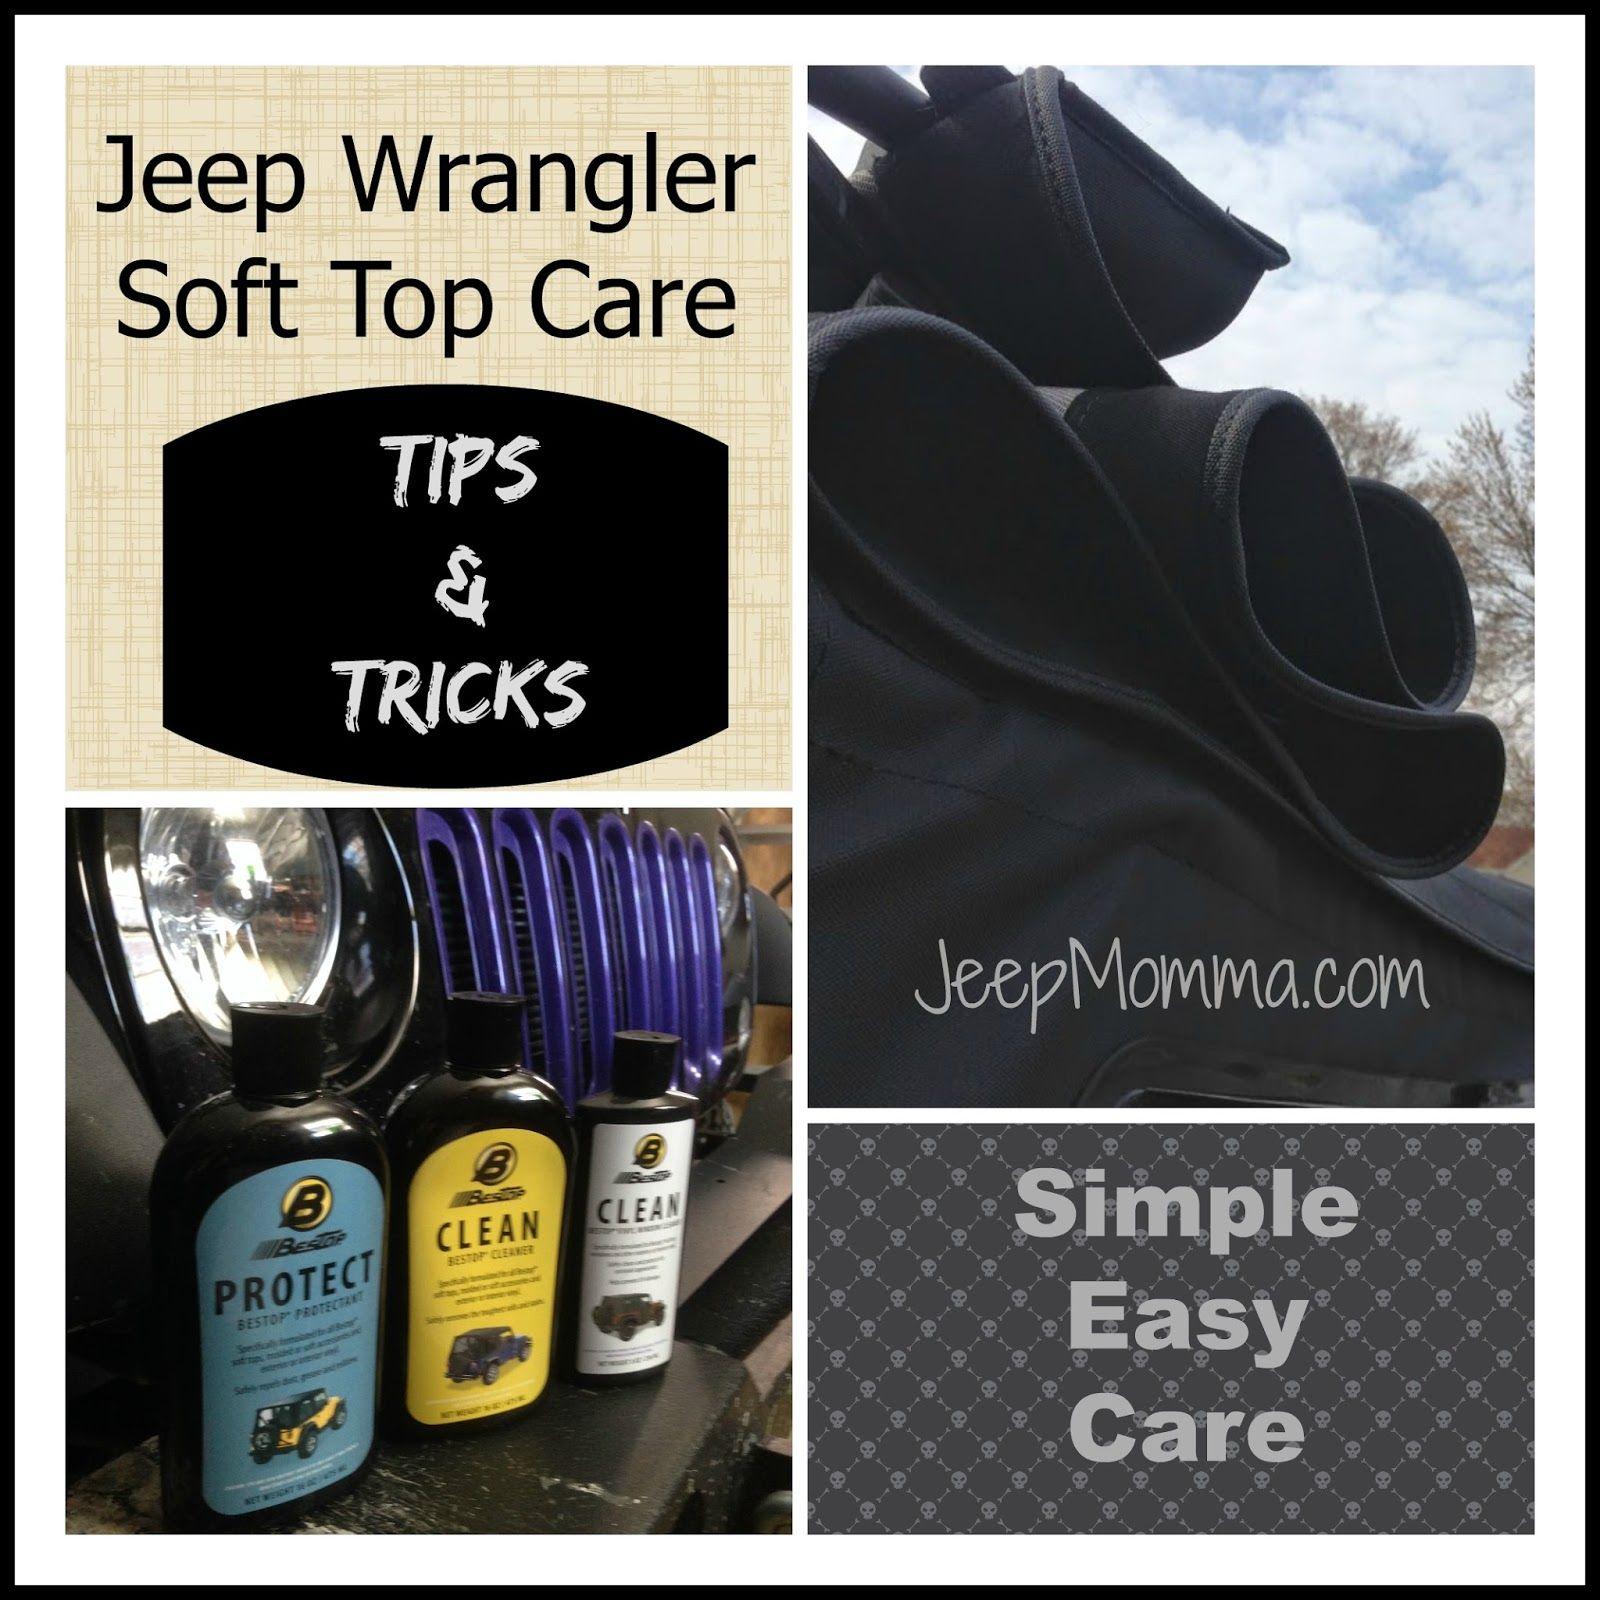 Soft Top Zipper Care Jeep Wrangler Soft Top Jeep Wrangler Accessories Diy Jeep